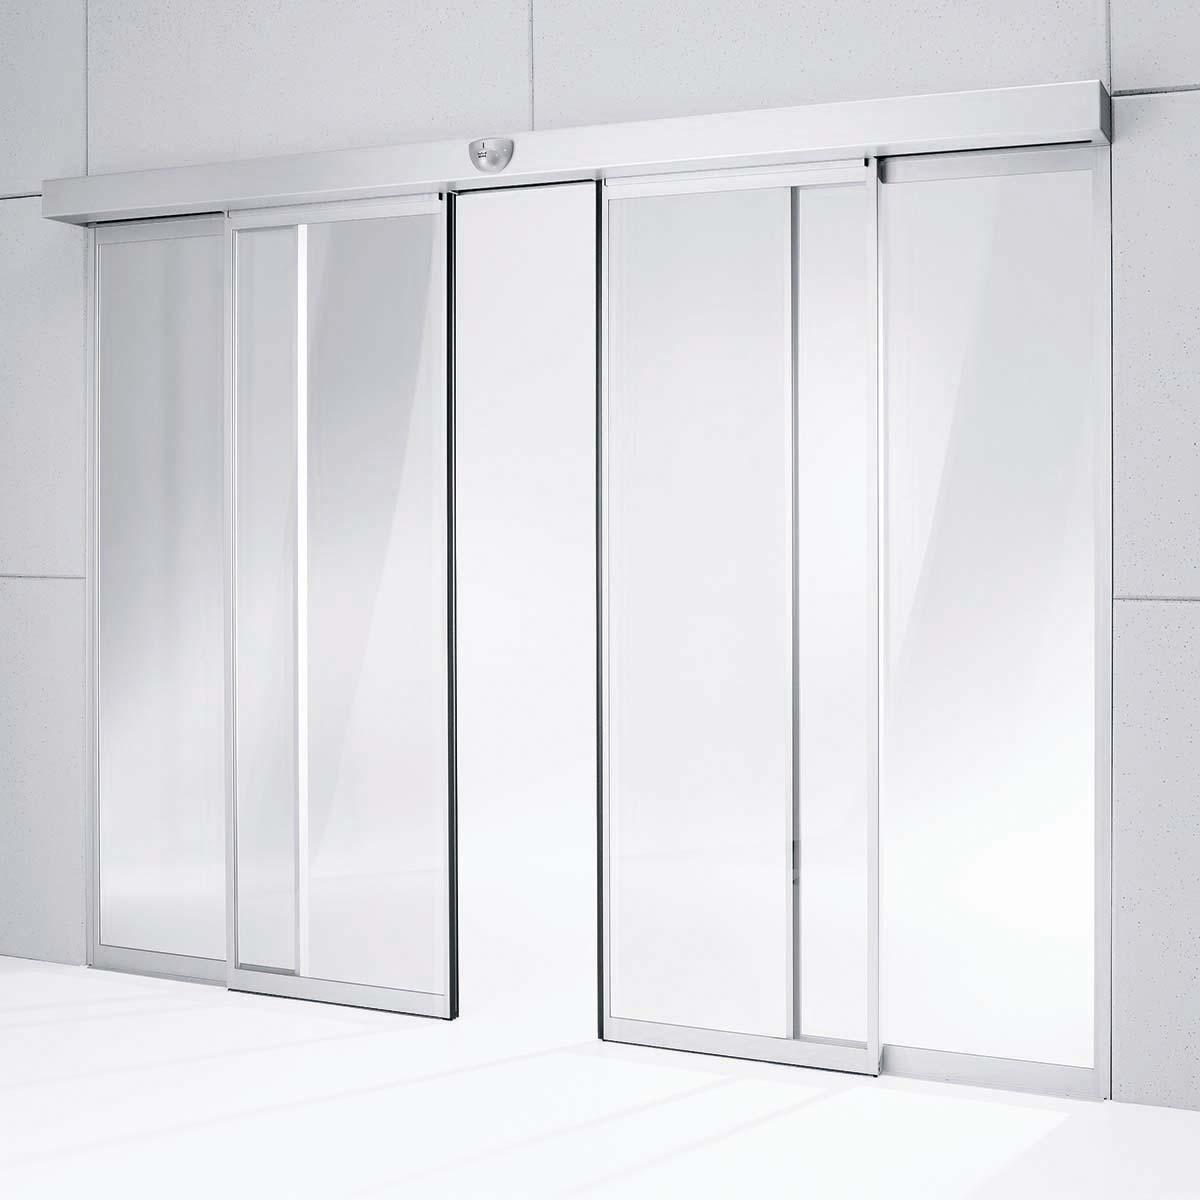 Dorma Automatic Sliding Door Es2001200 X 1200